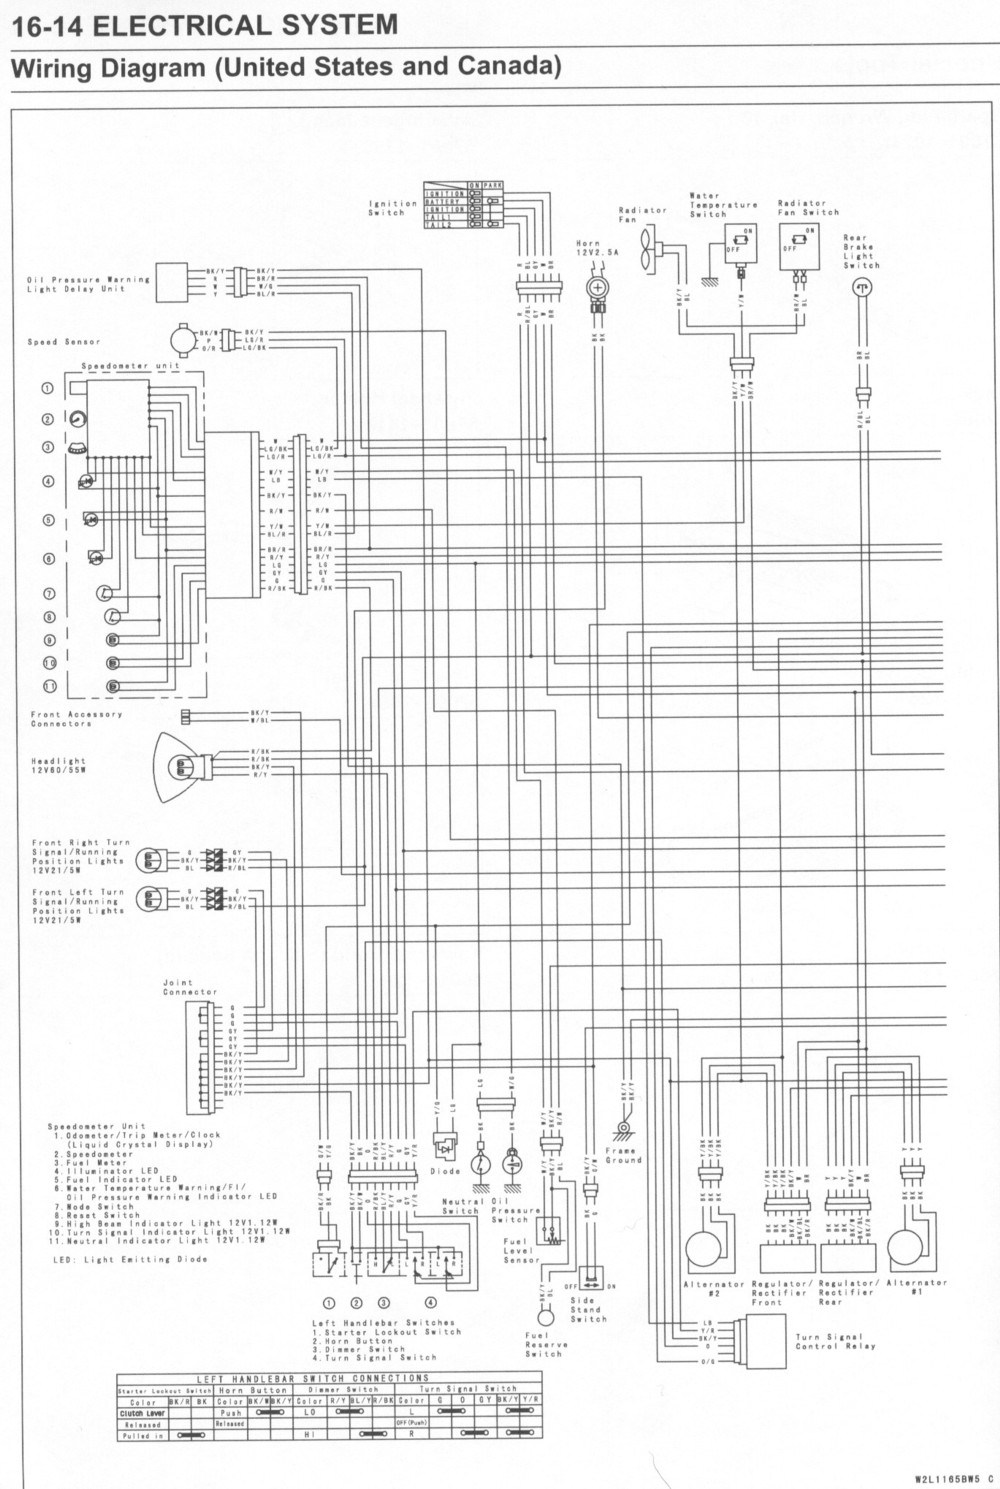 Kawasaki Vn 1500 Wiring Diagram - 1991 S10 Fuse Box -  jeep-wrangler.iabangjago.warmi.frWiring Diagram Resource